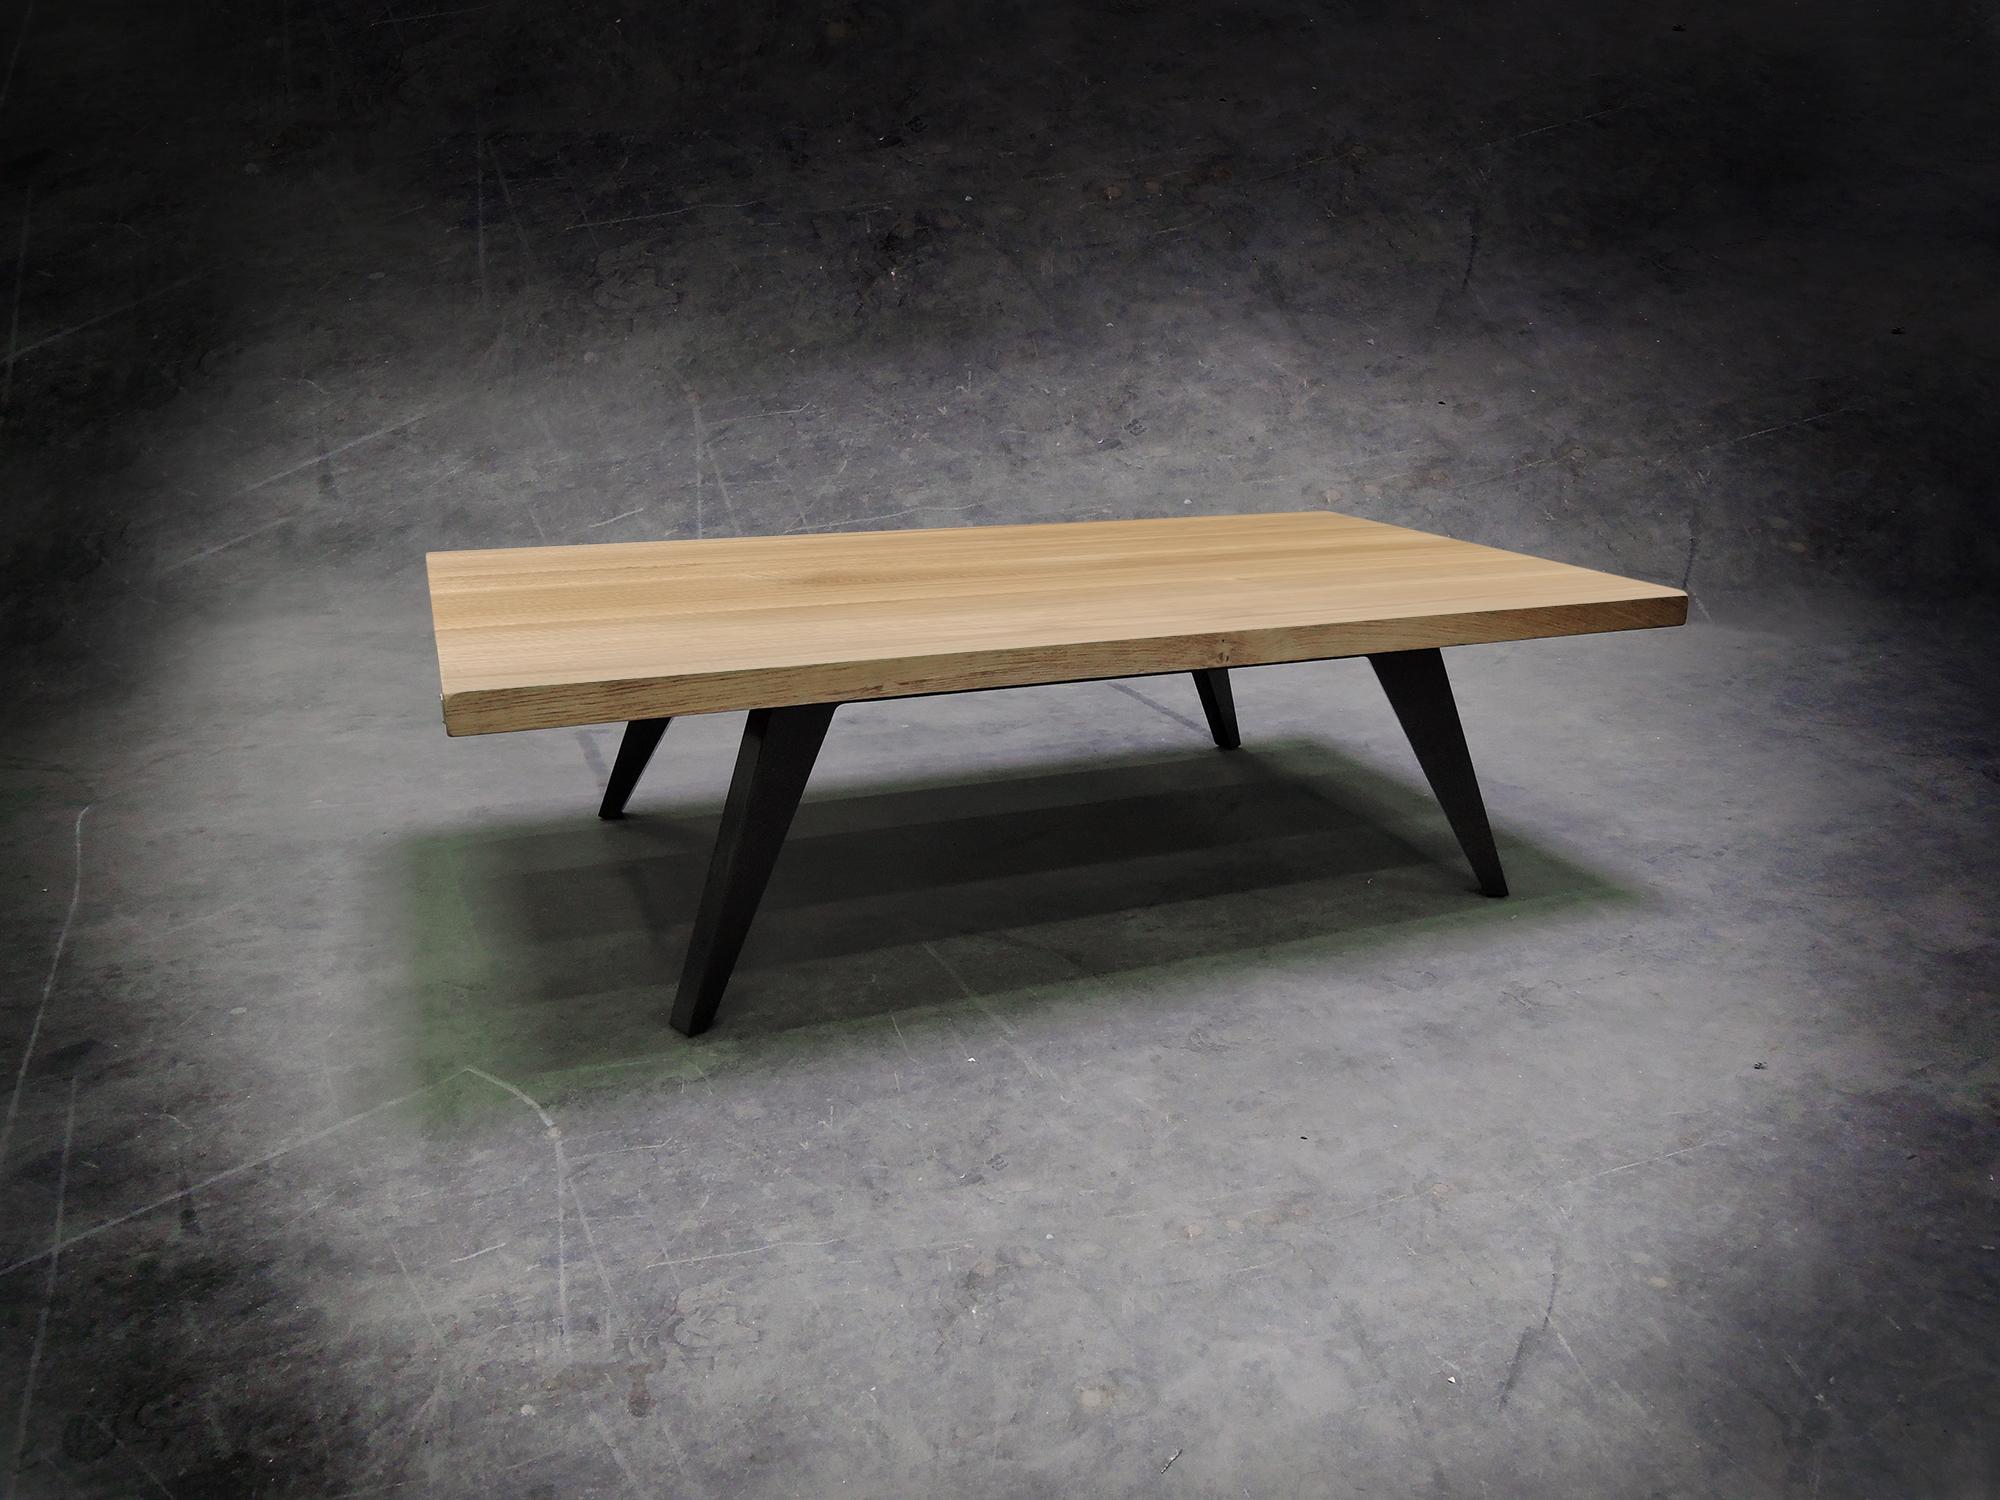 table basse amazone aluminium pleine masse et bois massif. Black Bedroom Furniture Sets. Home Design Ideas